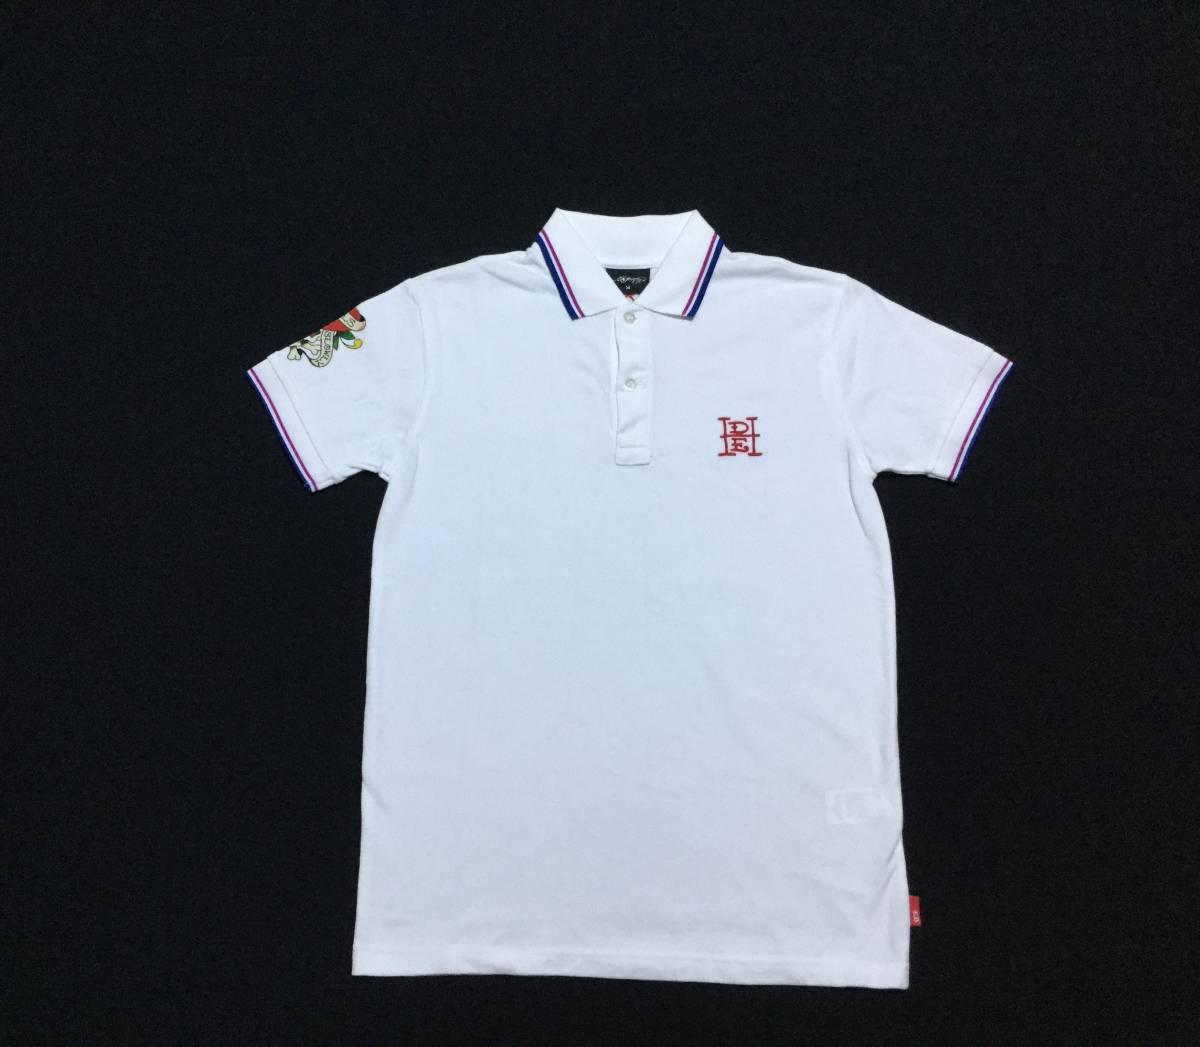 ED HARDY エドハーディー // 刺繍 プリント 半袖 ポロシャツ (白) サイズ M_画像1